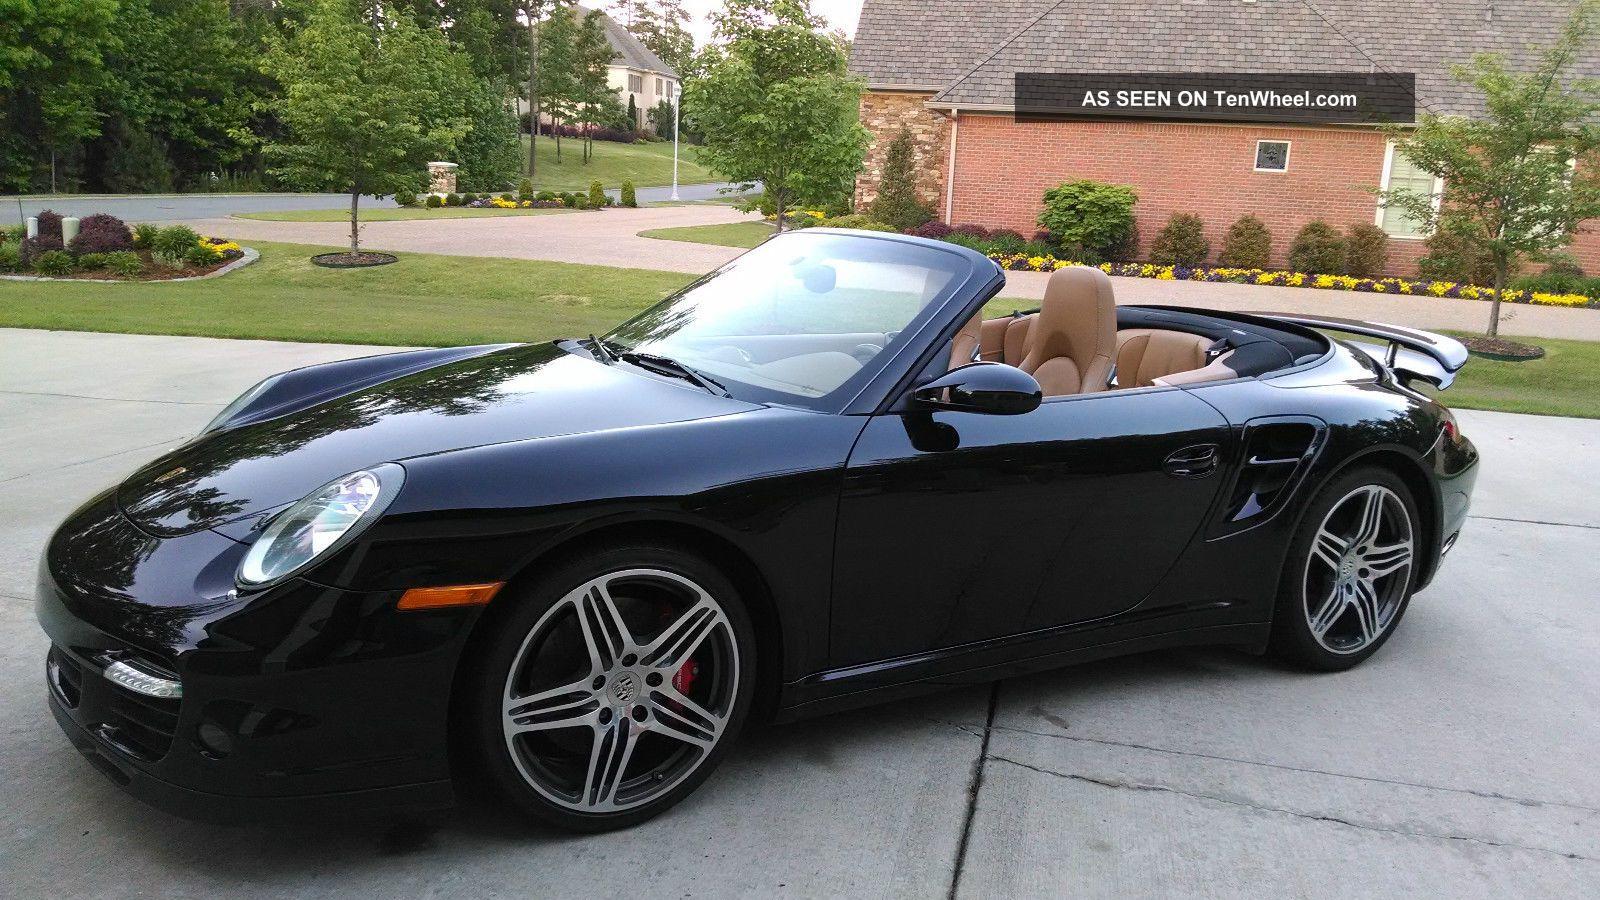 2008 porsche 911 turbo convertible 2 door 3 6l. Black Bedroom Furniture Sets. Home Design Ideas